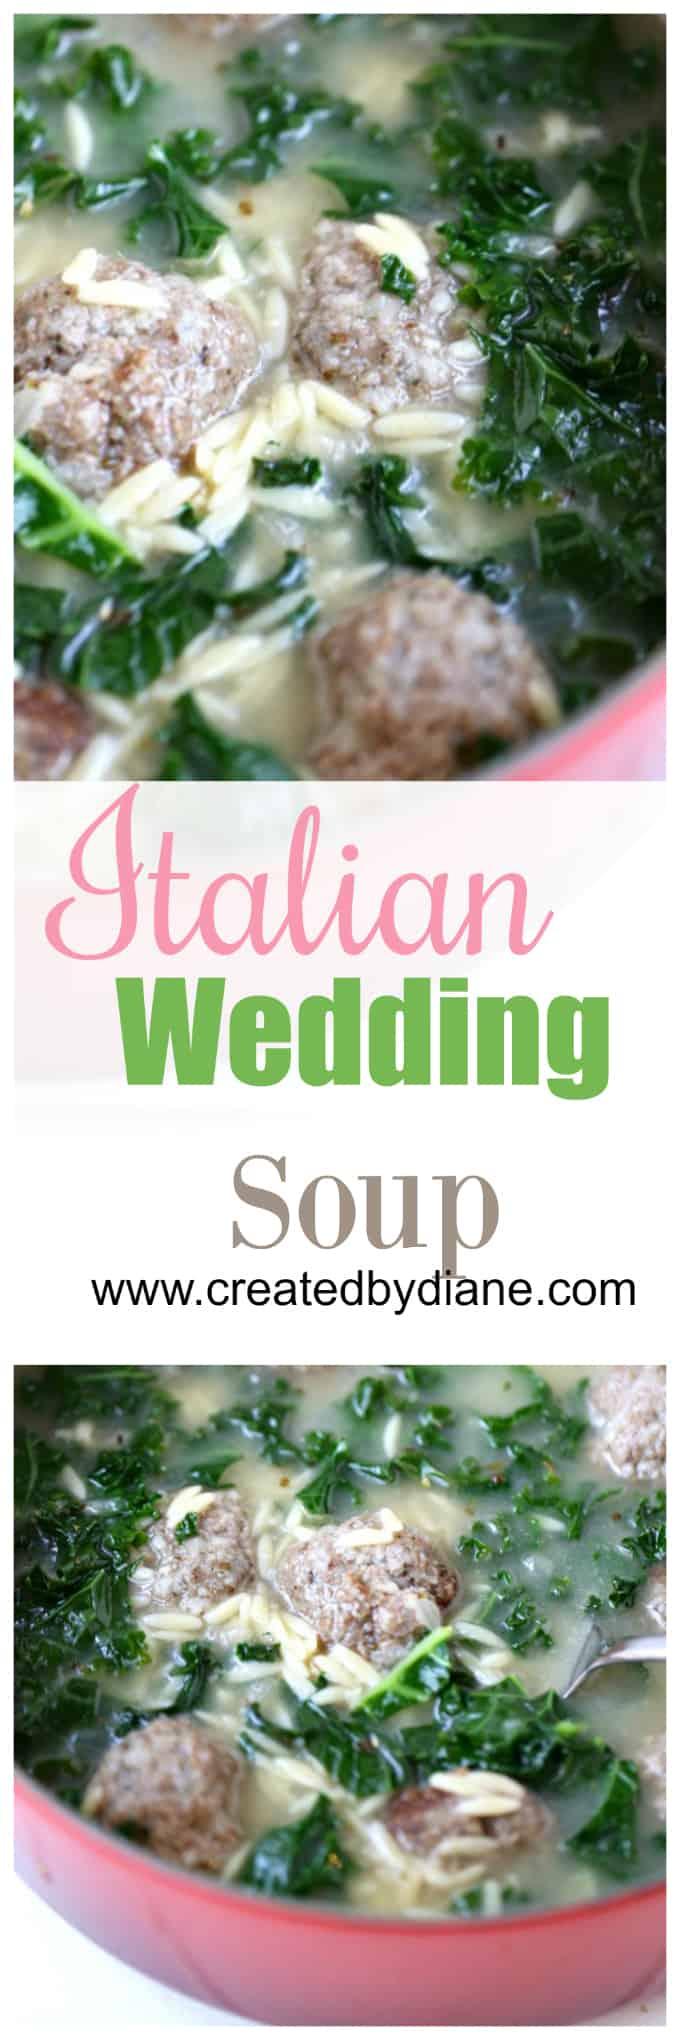 Italian Wedding Soup www.createdbydiane.com